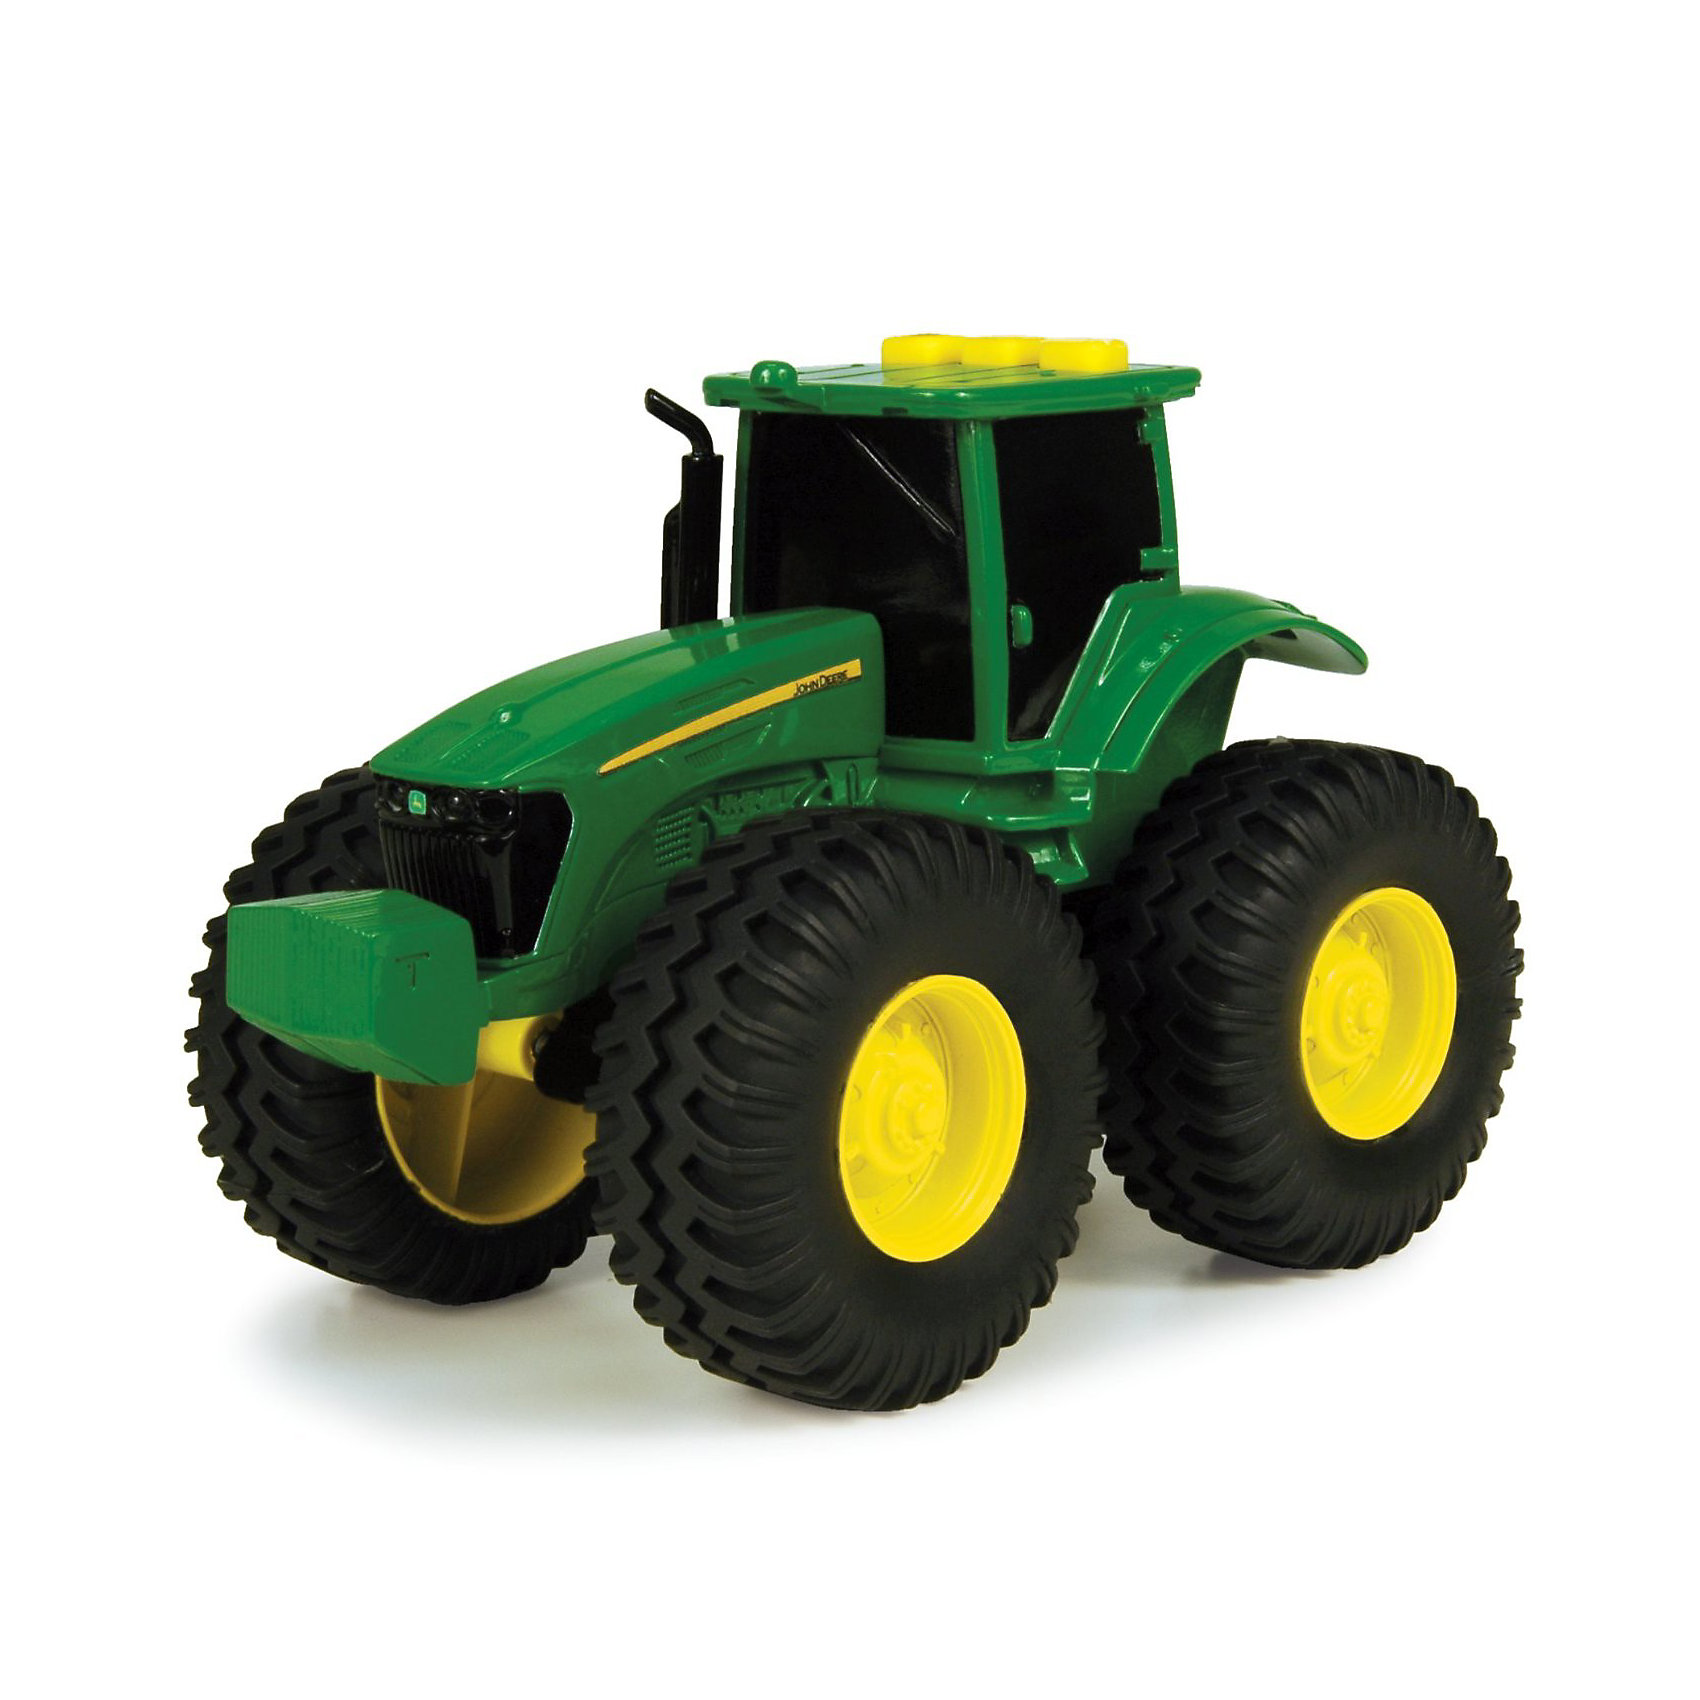 TOMY Трактор с большими колесами, TOMY машины tomy трактор john deere monster treads с большими резиновыми колесами